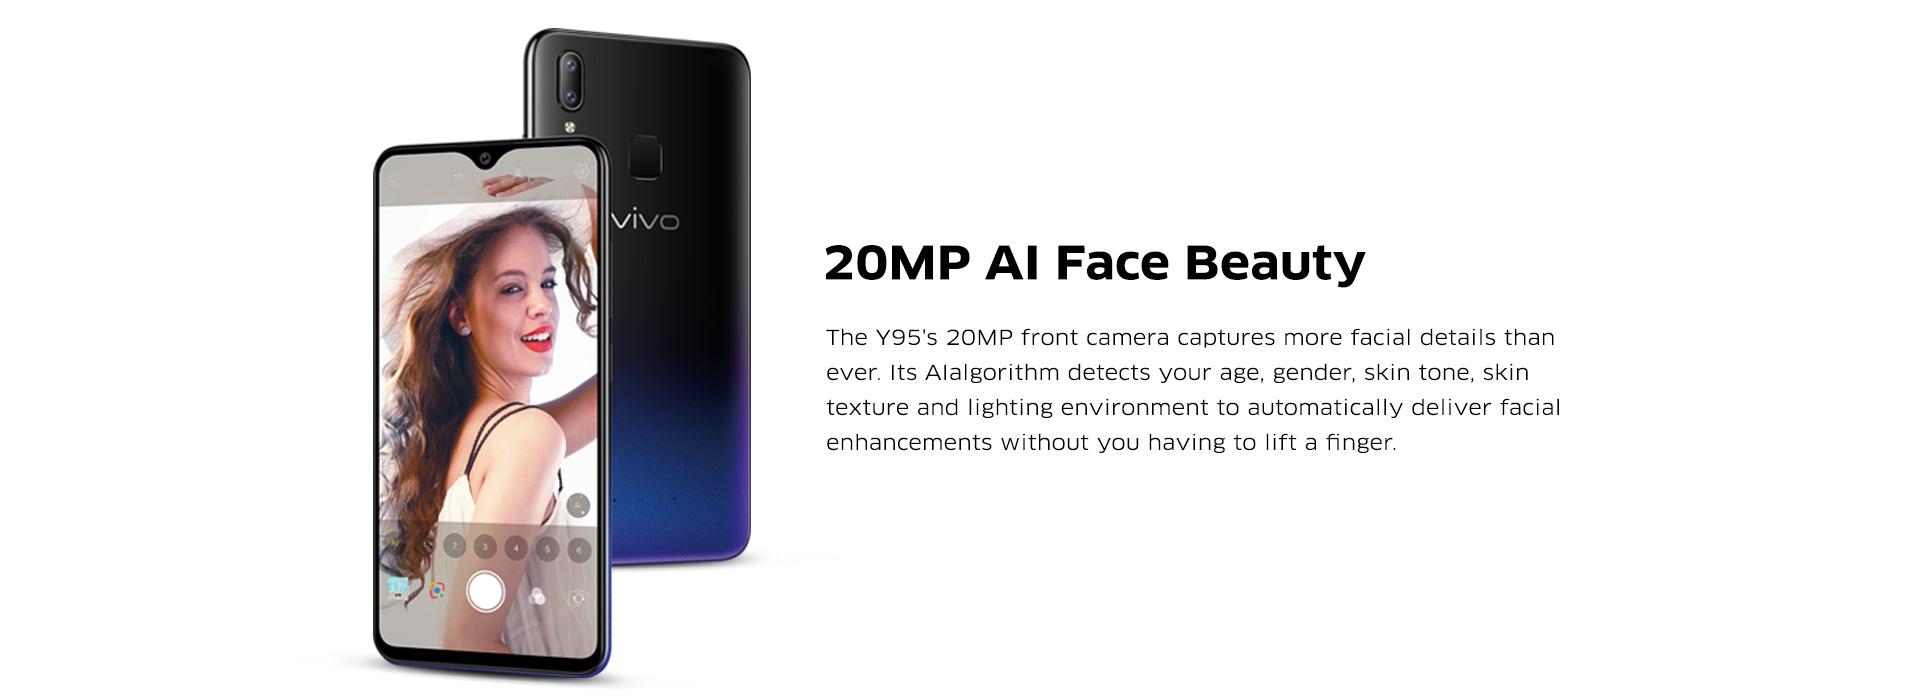 Vivo Best Selfie 20MP AI Camera Smartphone 2018 – AI Face Beauty